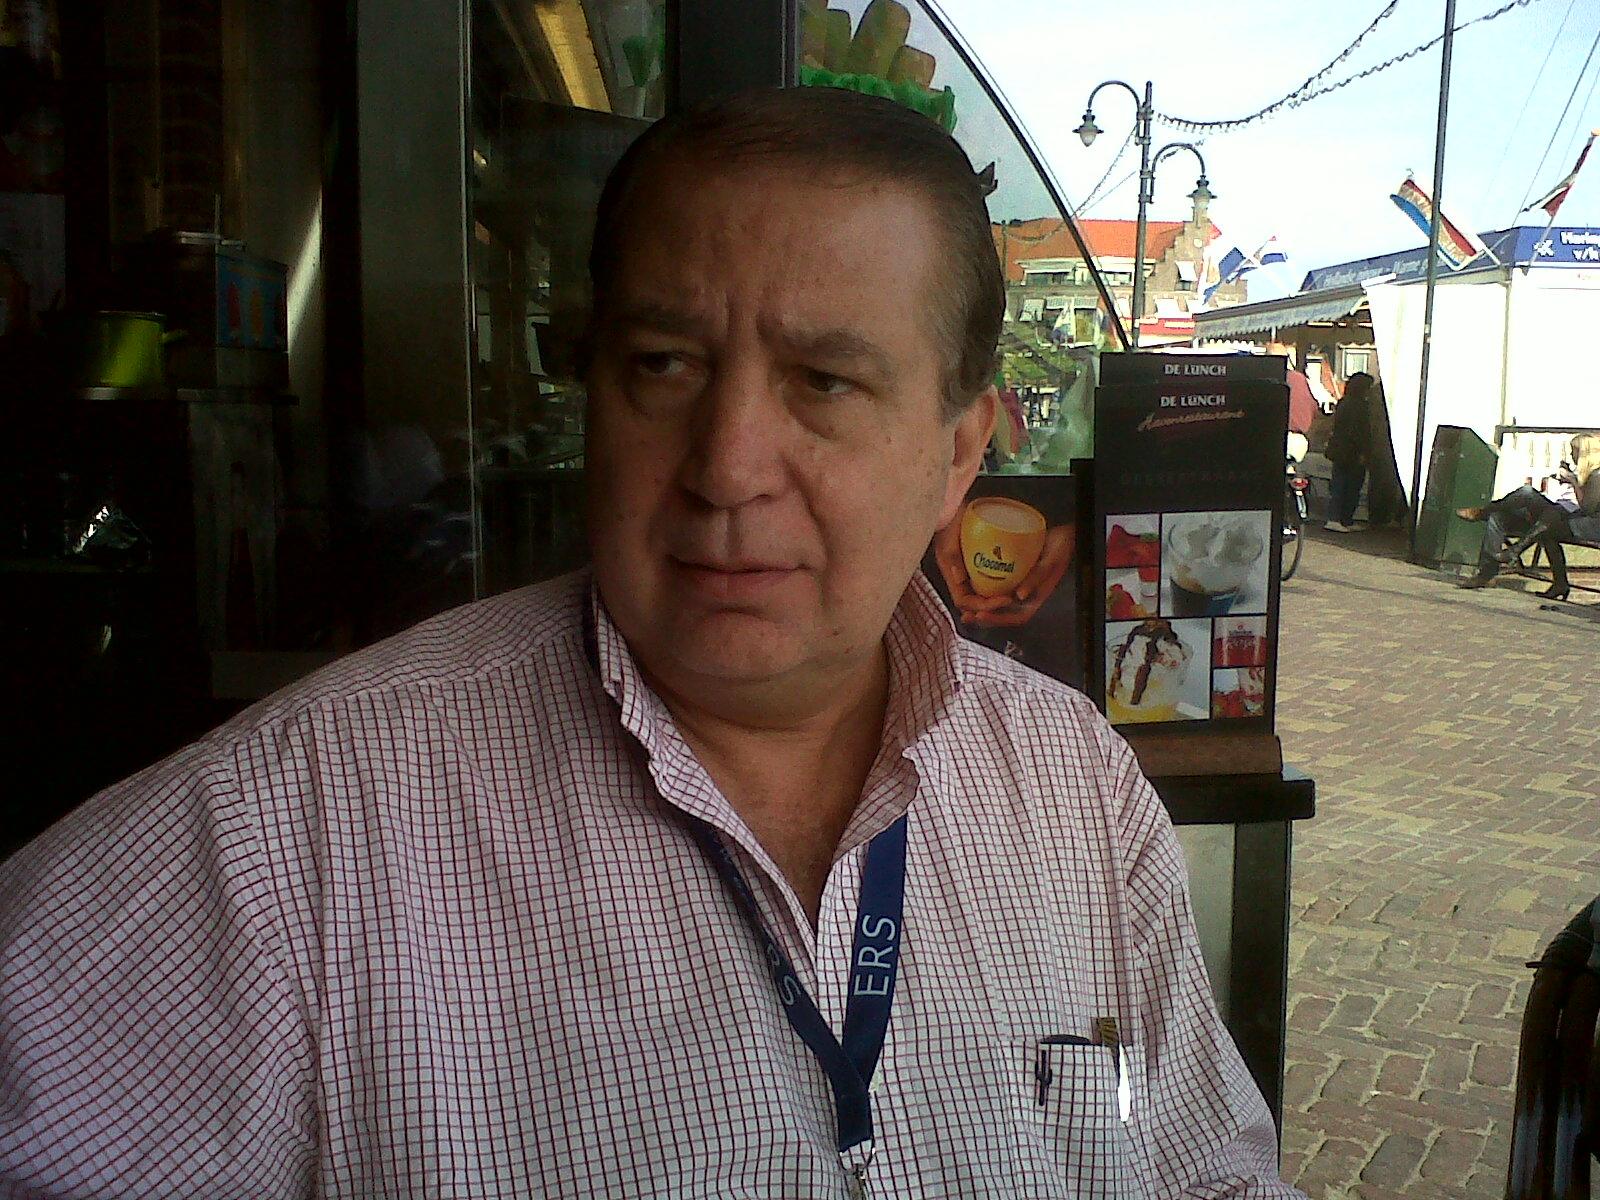 Jorge Alberto Rosso